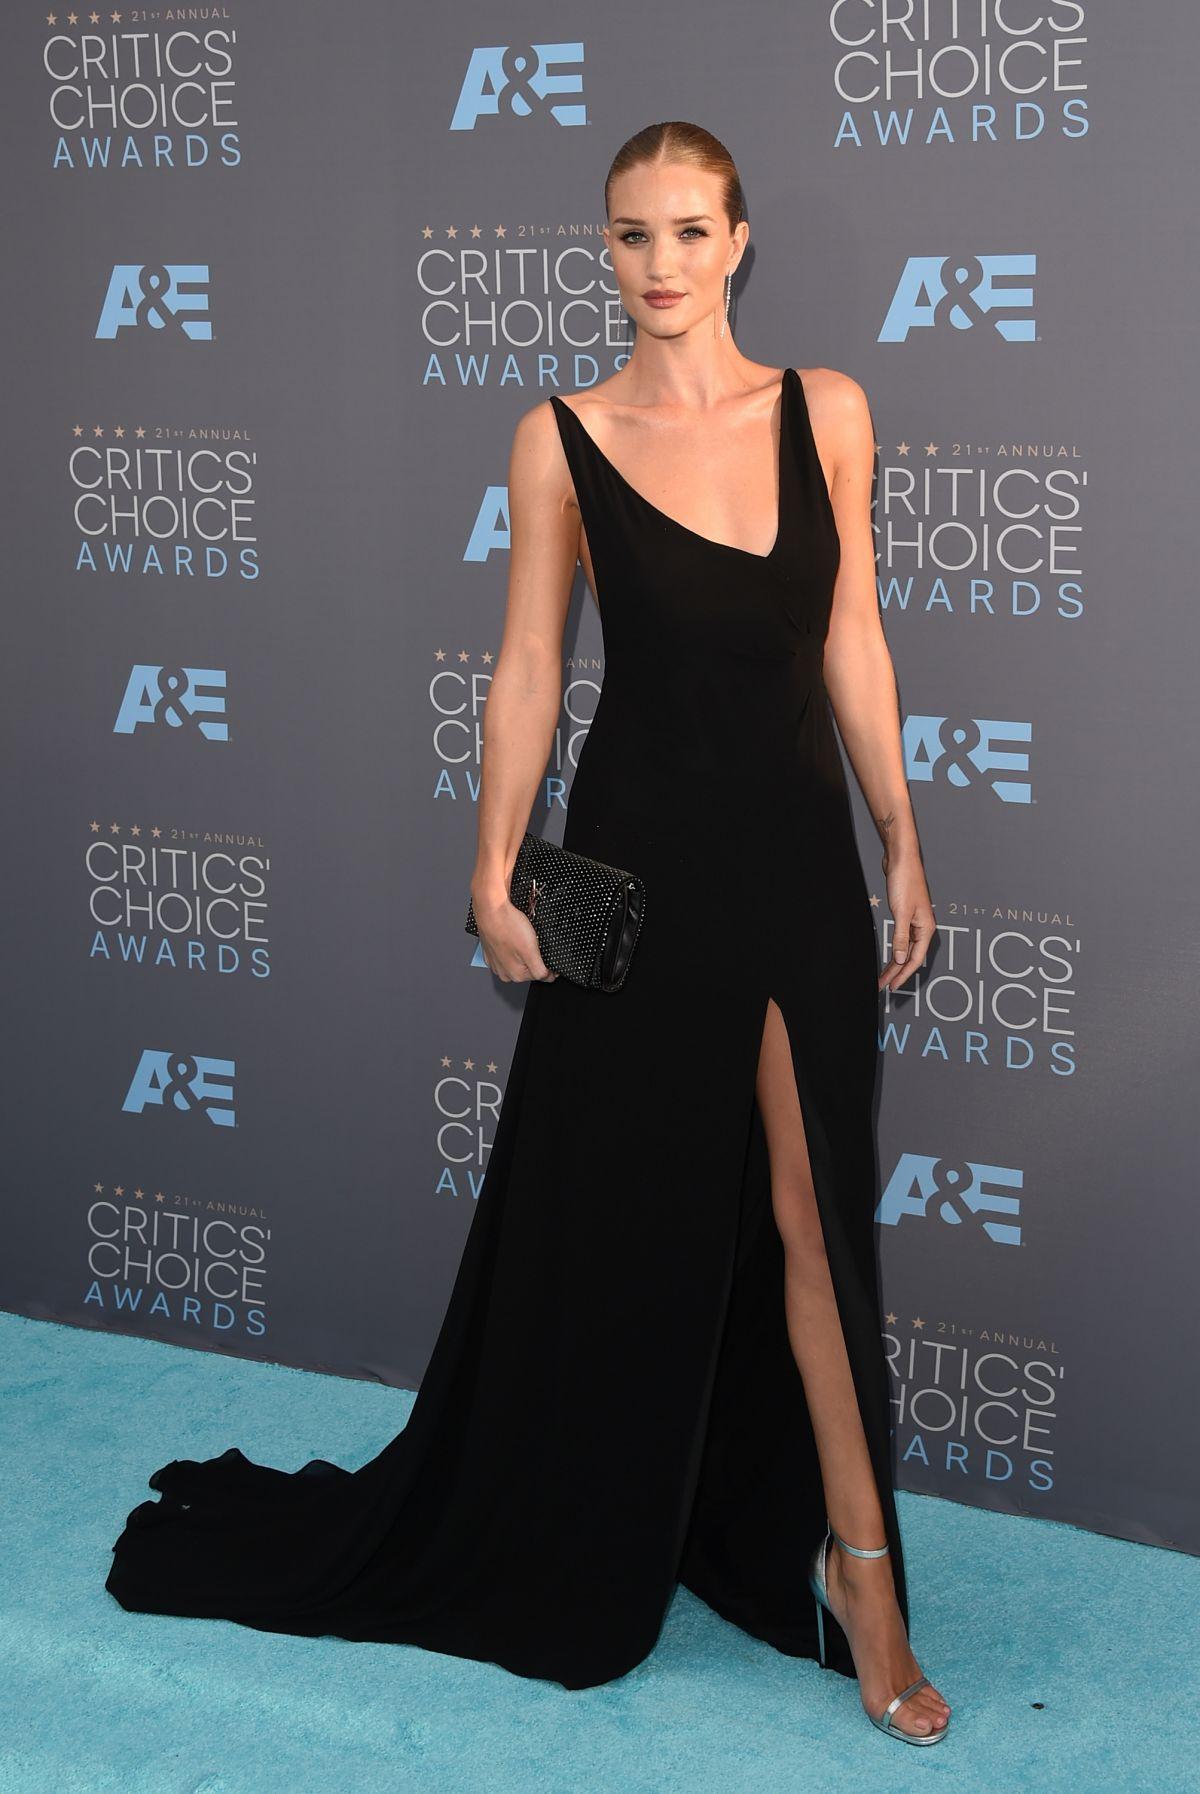 ROSIE HUNTINGTON-WHITELEY at Critics's Choice Awards 2016 in Santa Monica 01/17/2016